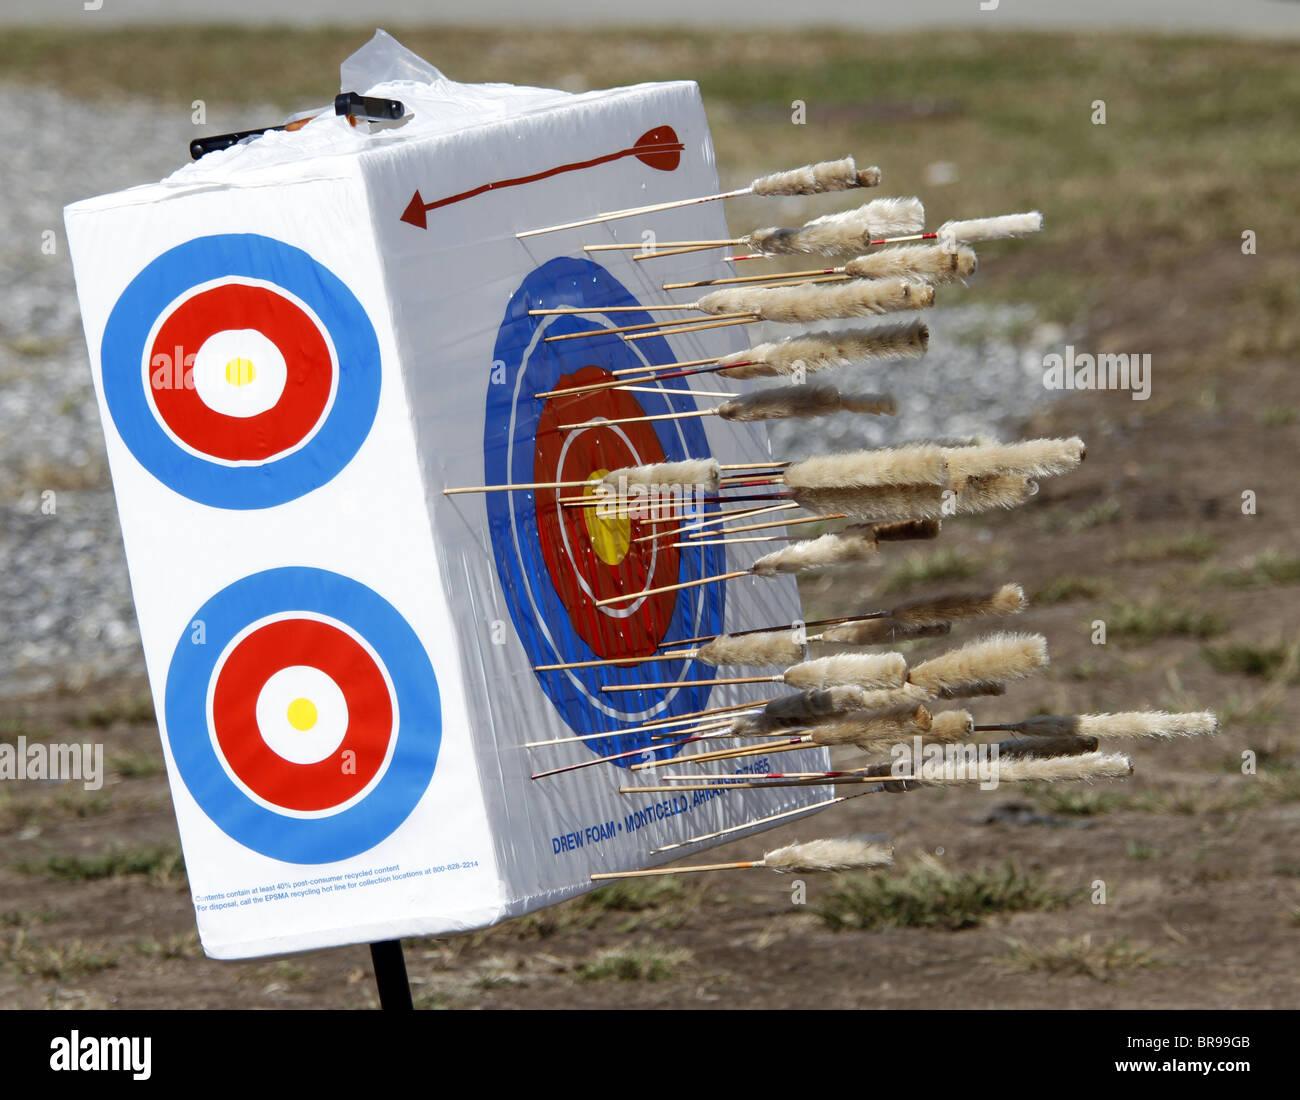 Cherokee, North Carolina - Target used in a blowgun contest